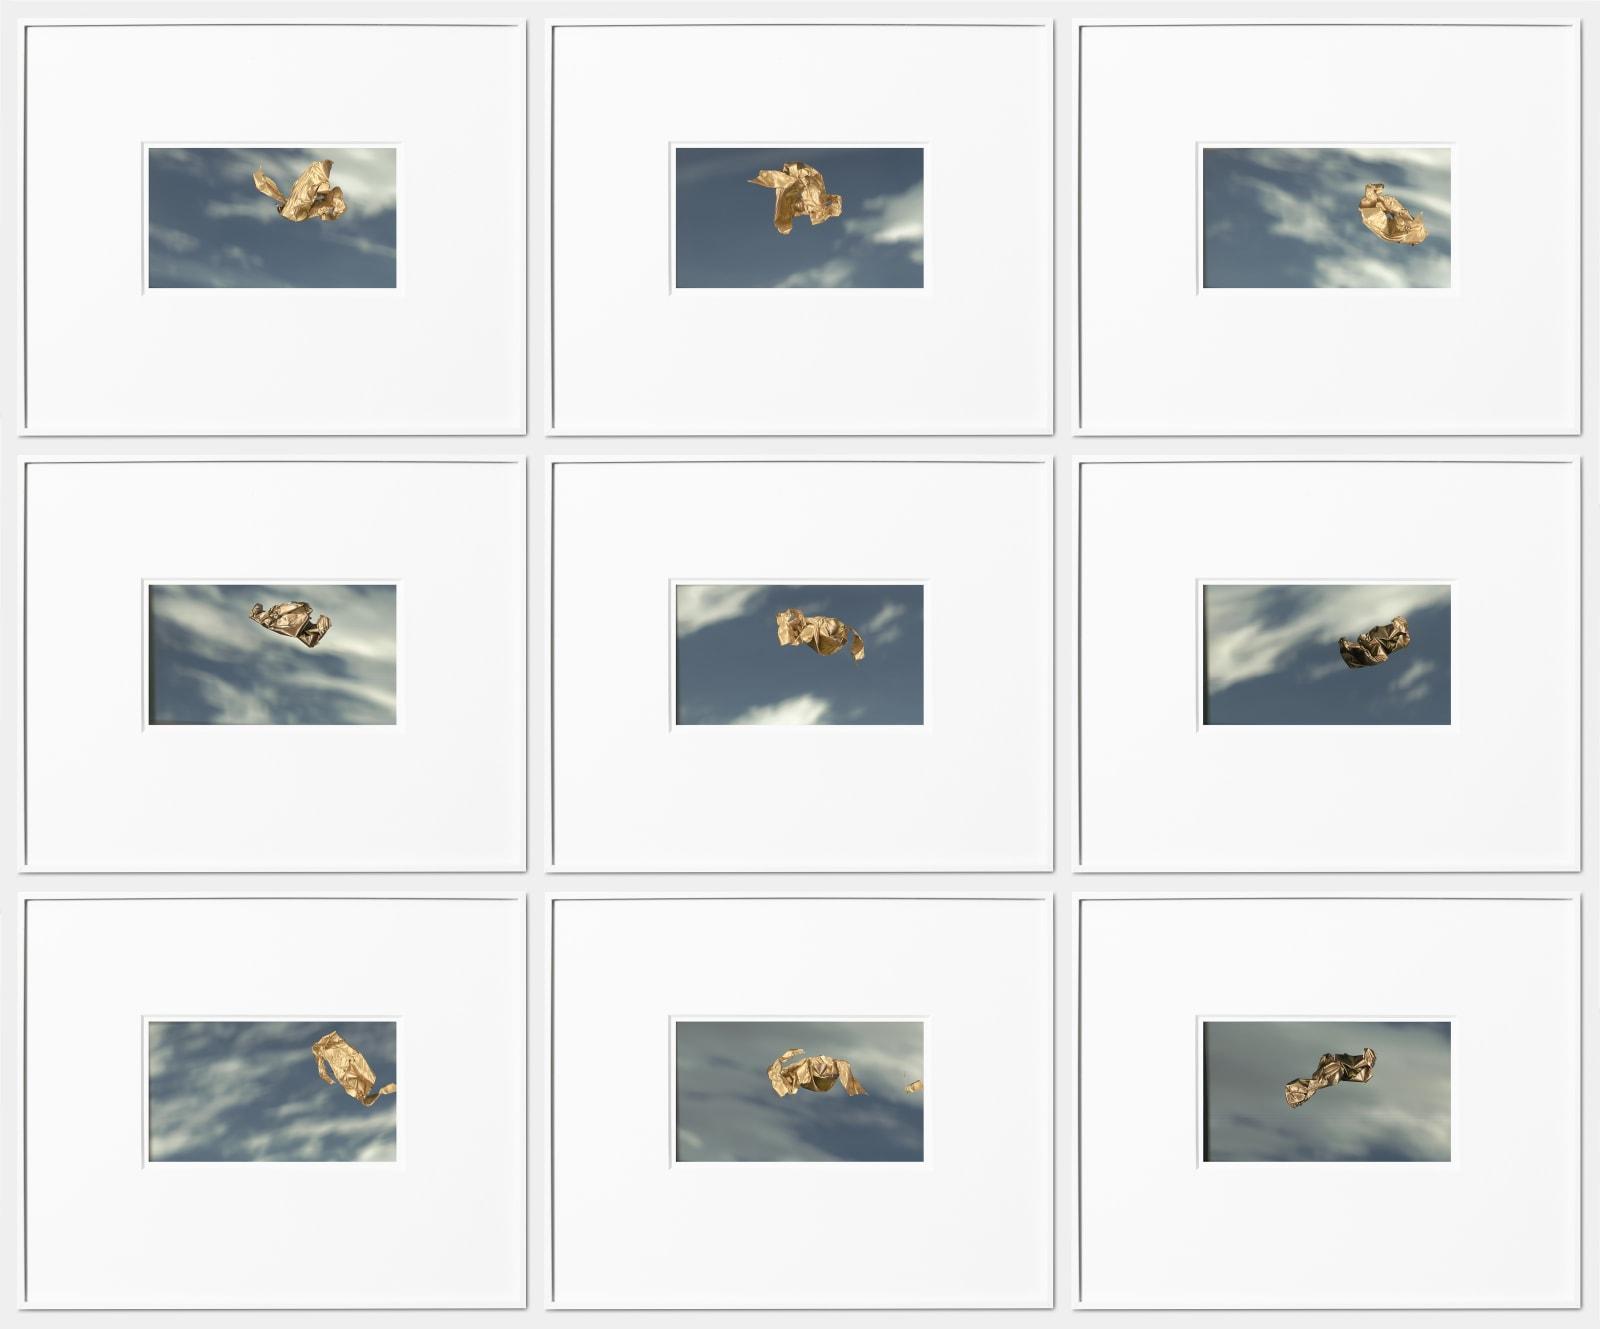 André Hemer Vienna Sky Scans (2019-03-07, 14:49—15:13 CET), 2019